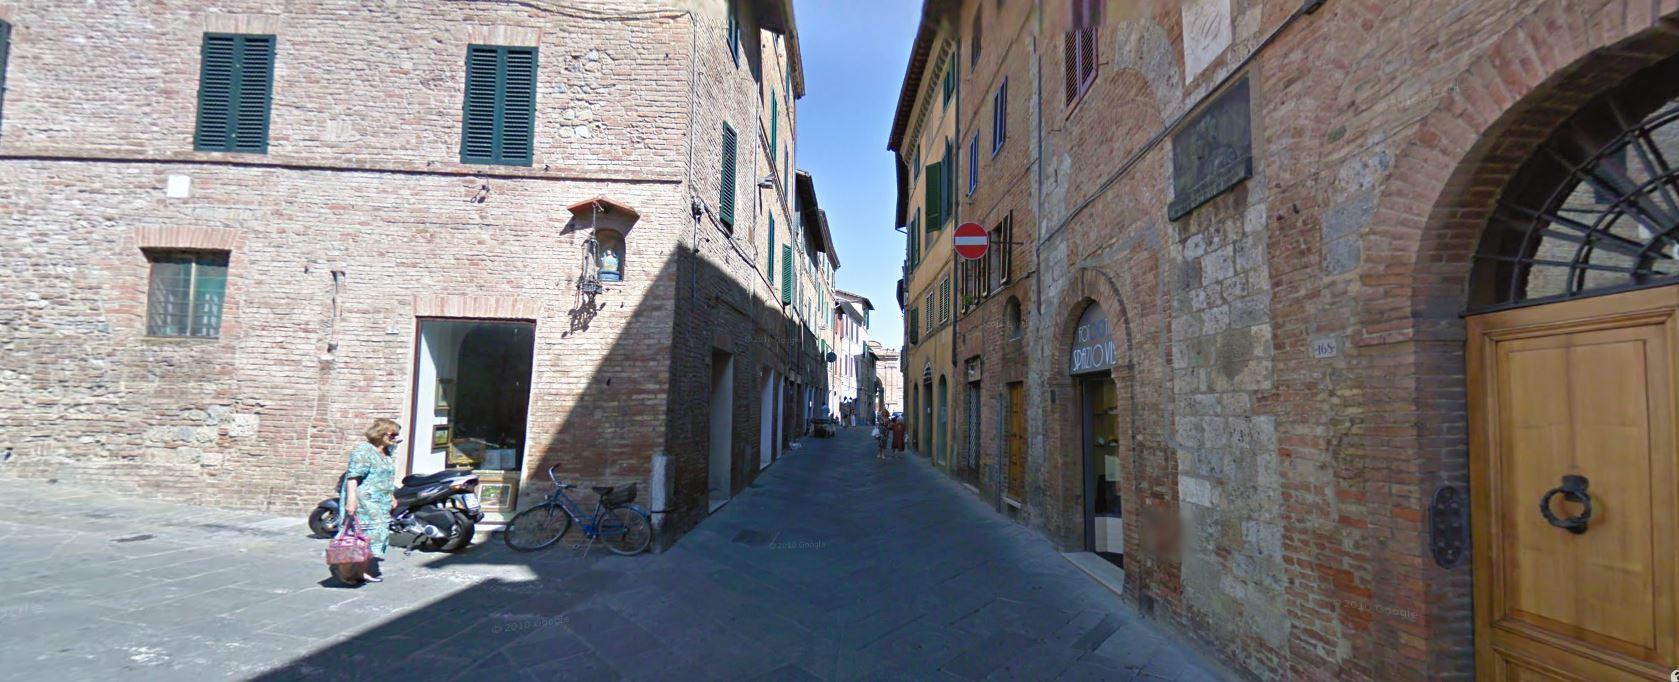 Mostra a Siena del Gruppo Toscana-Arte G.March